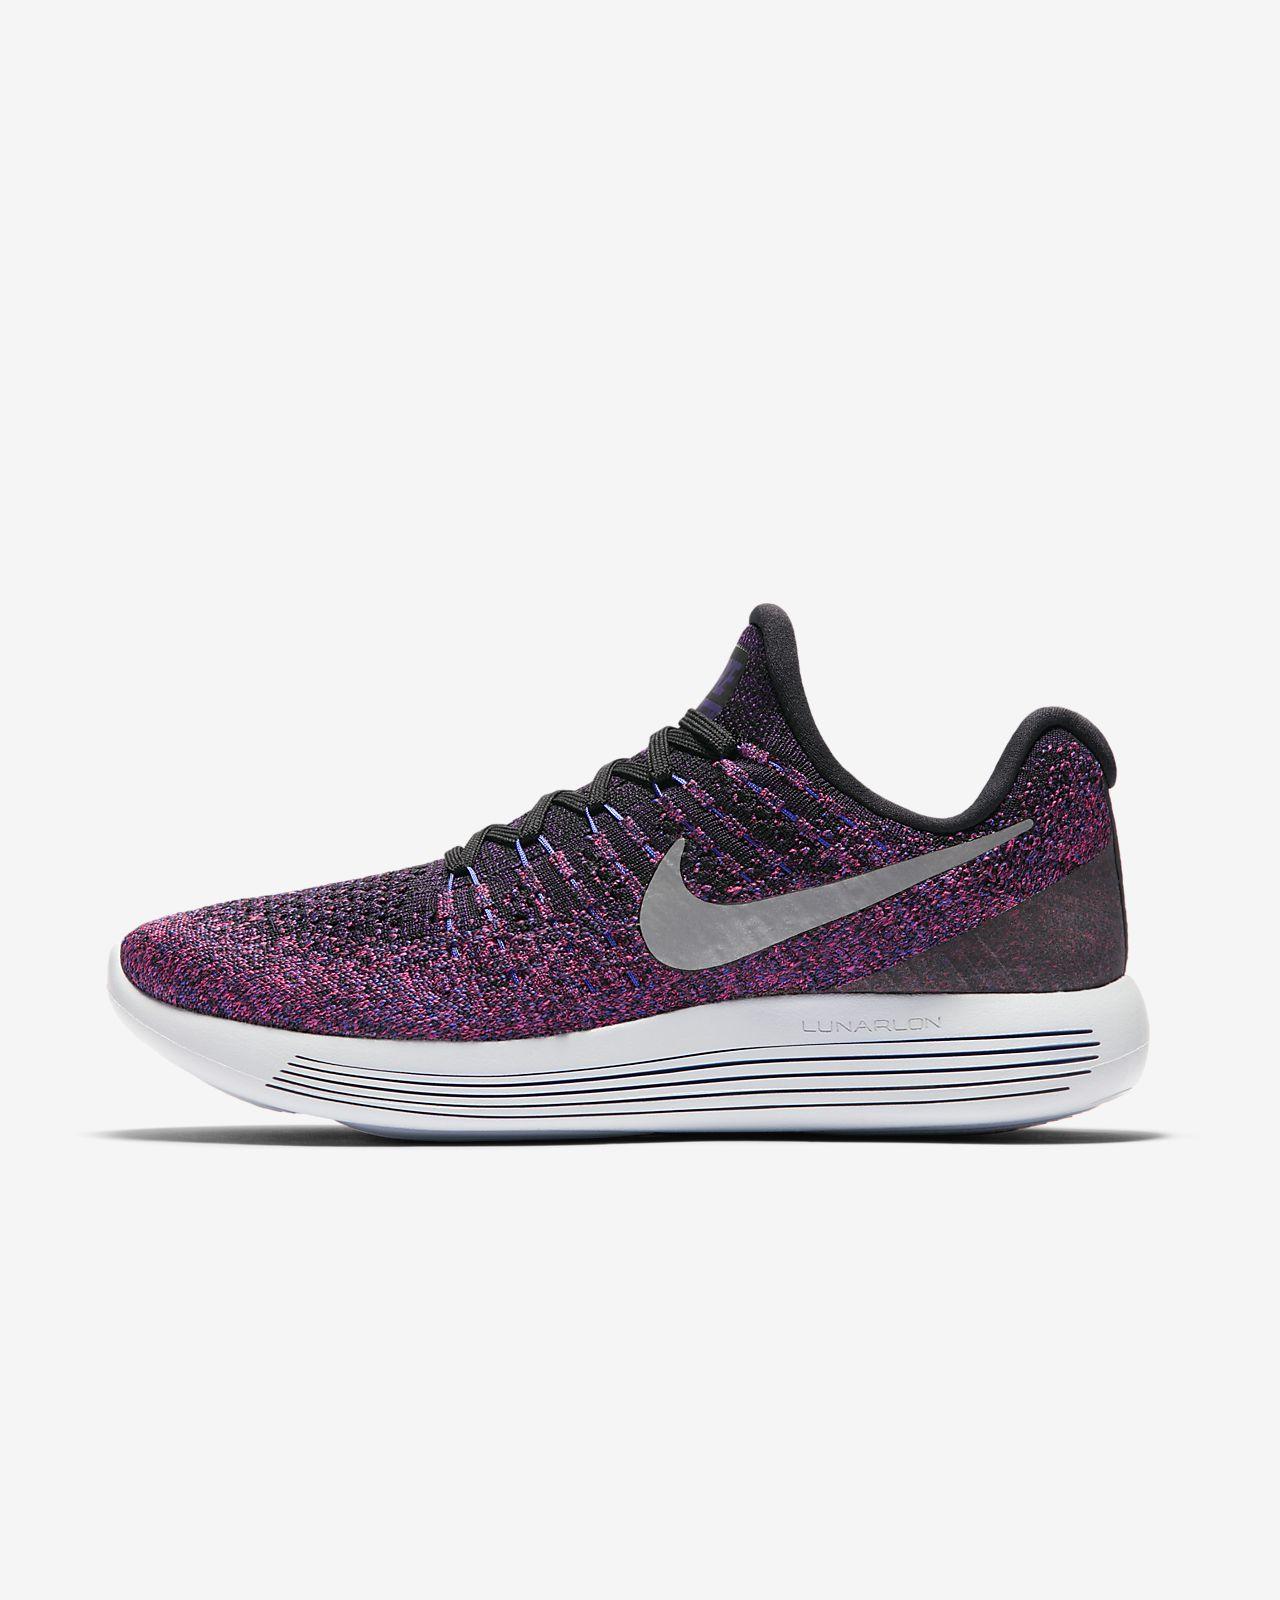 Refined Women's Nike Purple Running Shoes